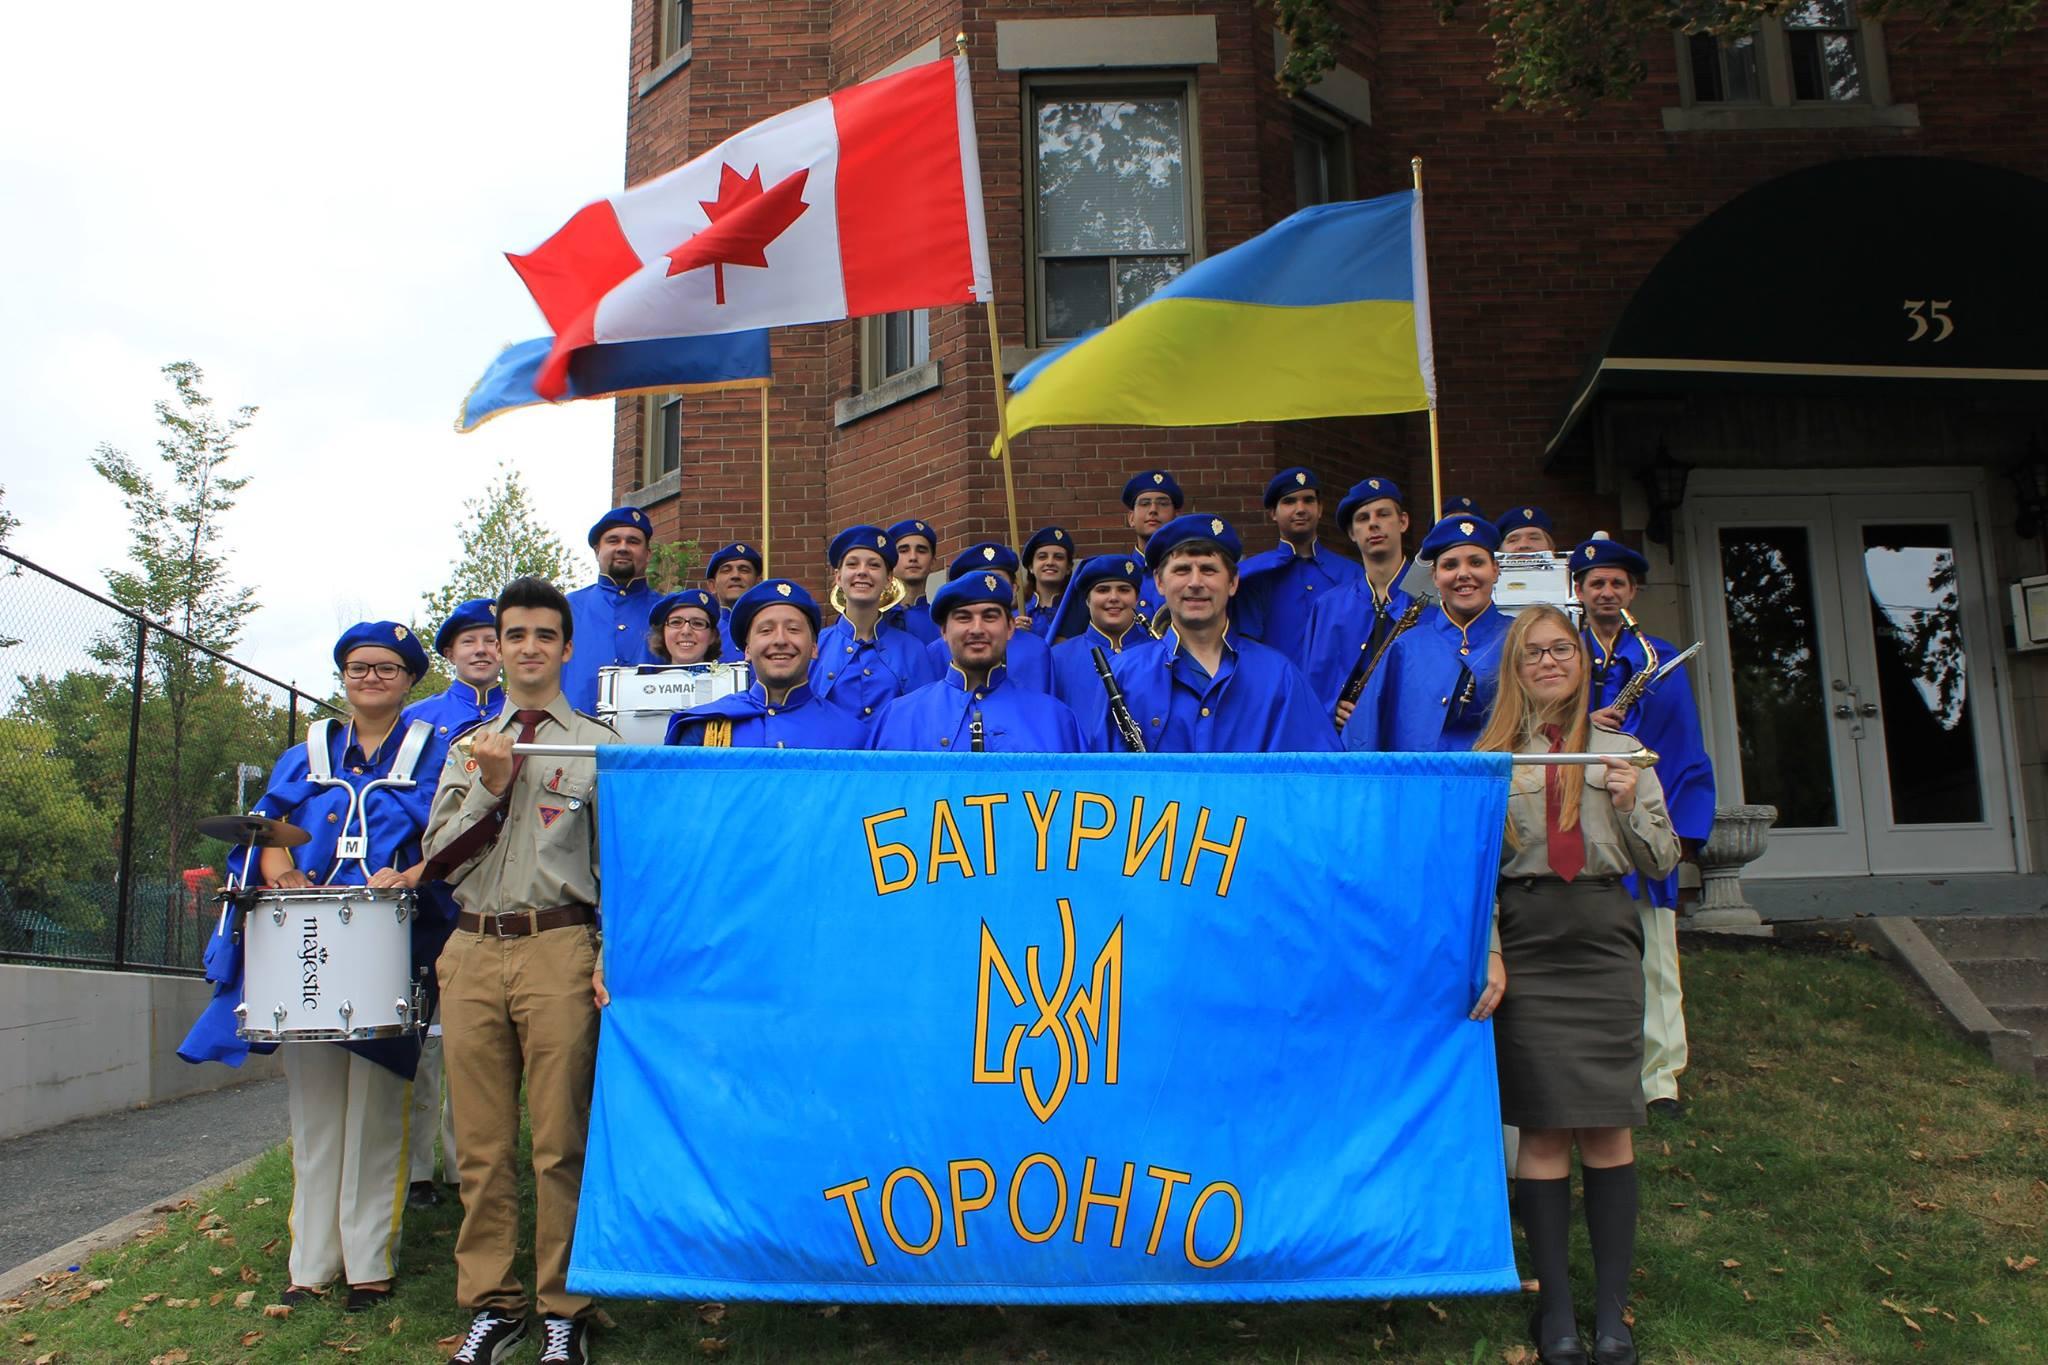 Toronto Ukrainian Bloor West Village Festival - Sep 19, 2015